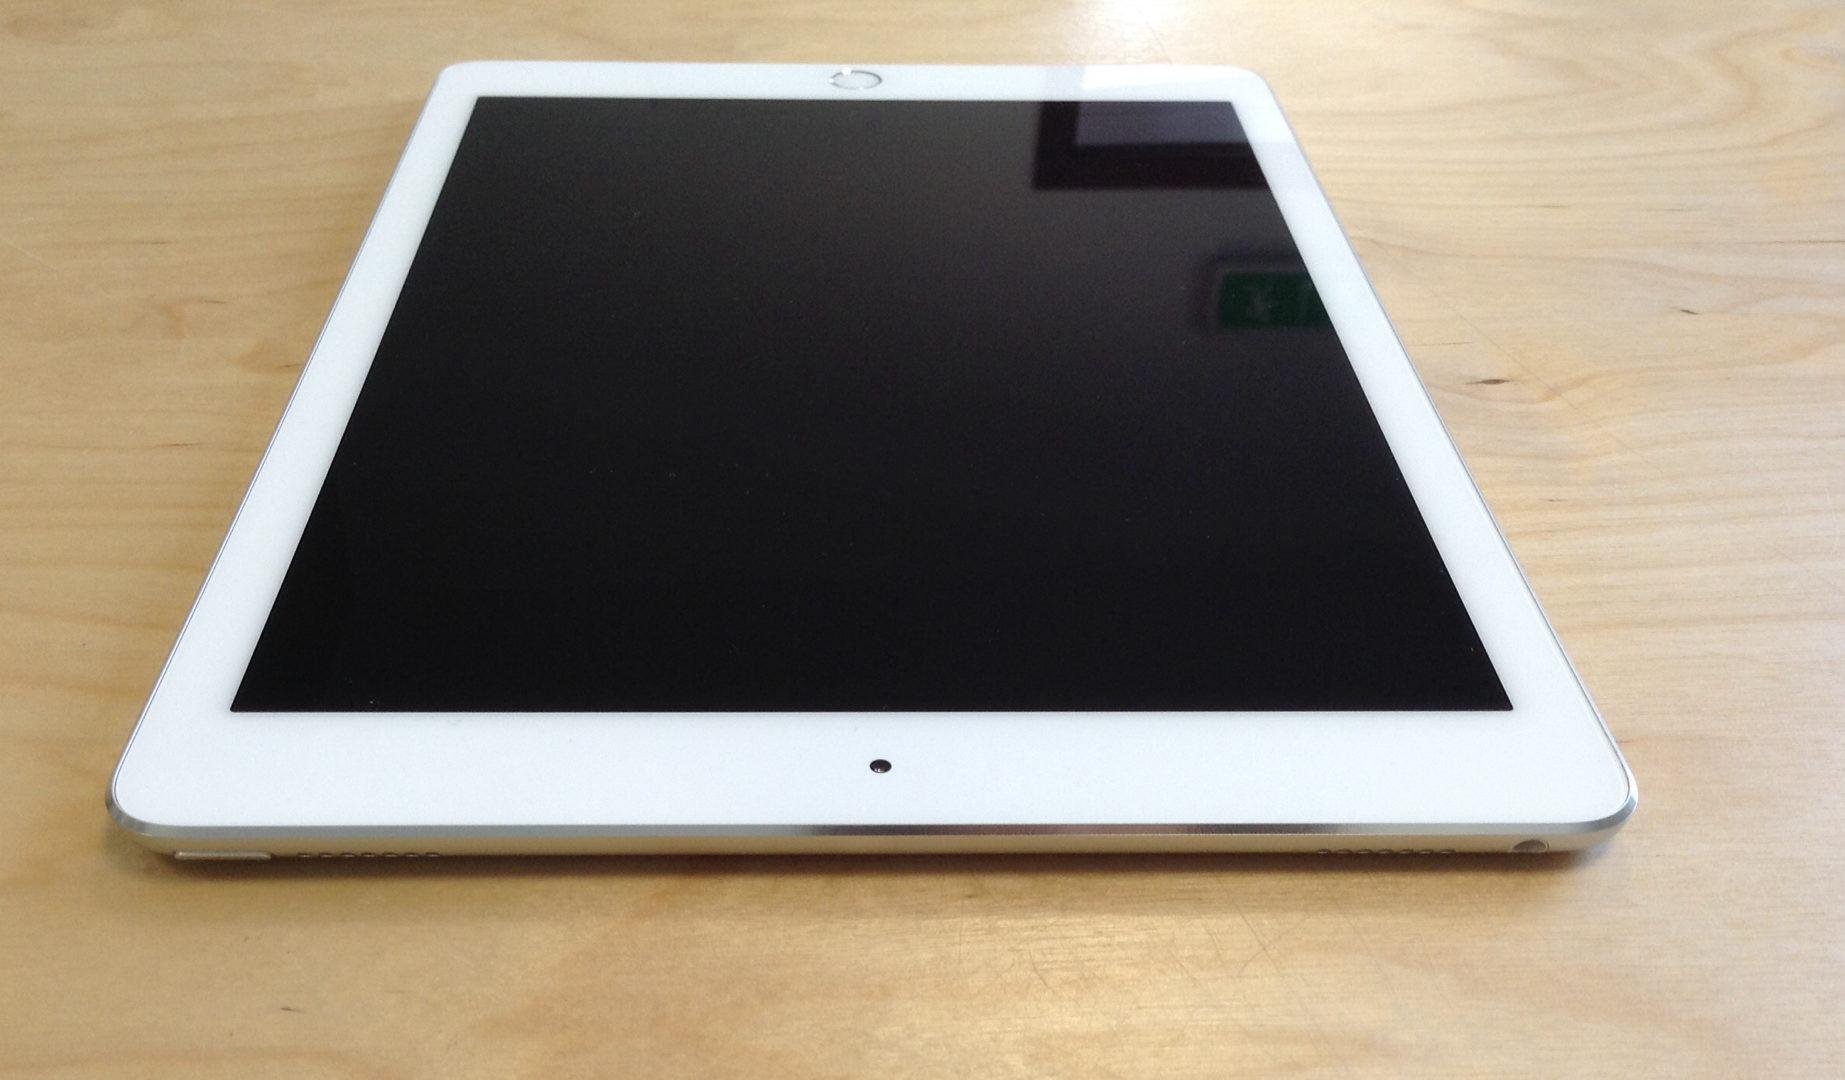 iPad Pro 9.7-inch (Wi-Fi), 128 GB, Gold, imagen 7